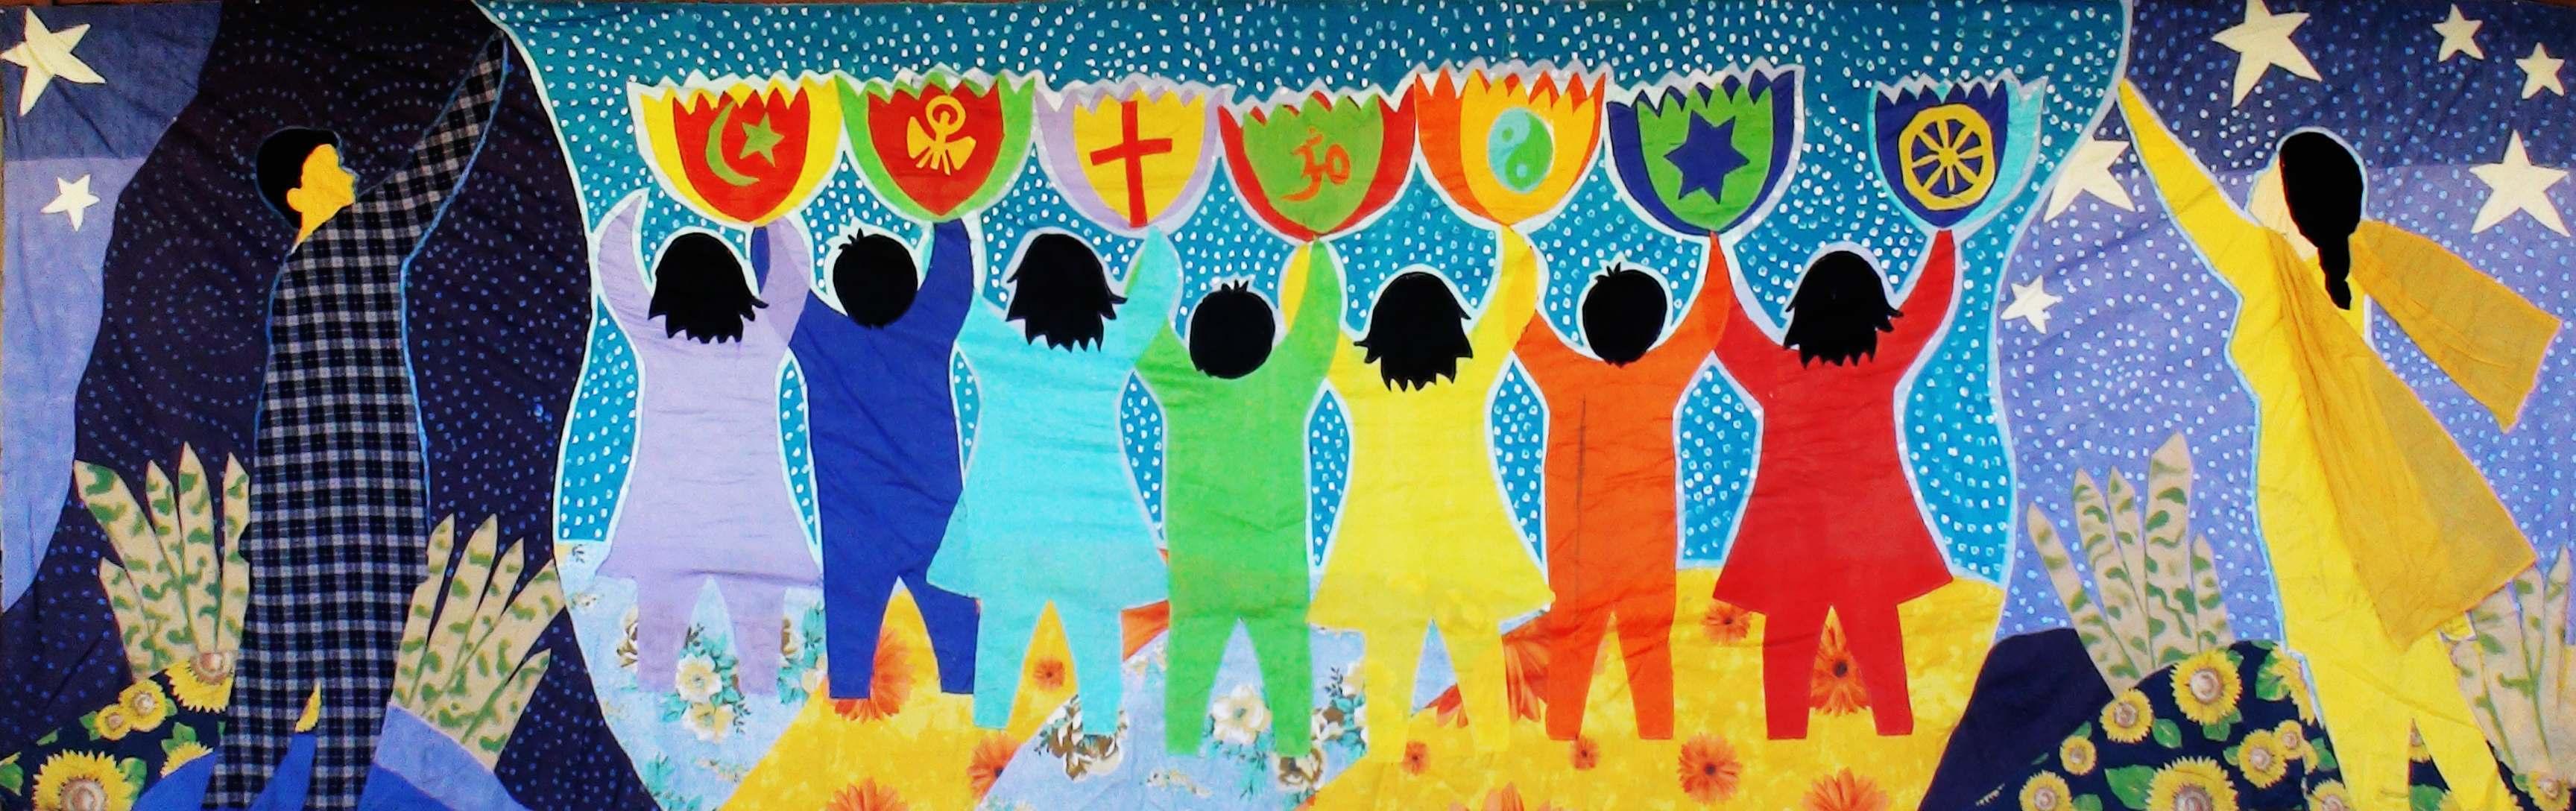 Healing hearts mural art afghanistan pakistan tickets for Art miles mural project